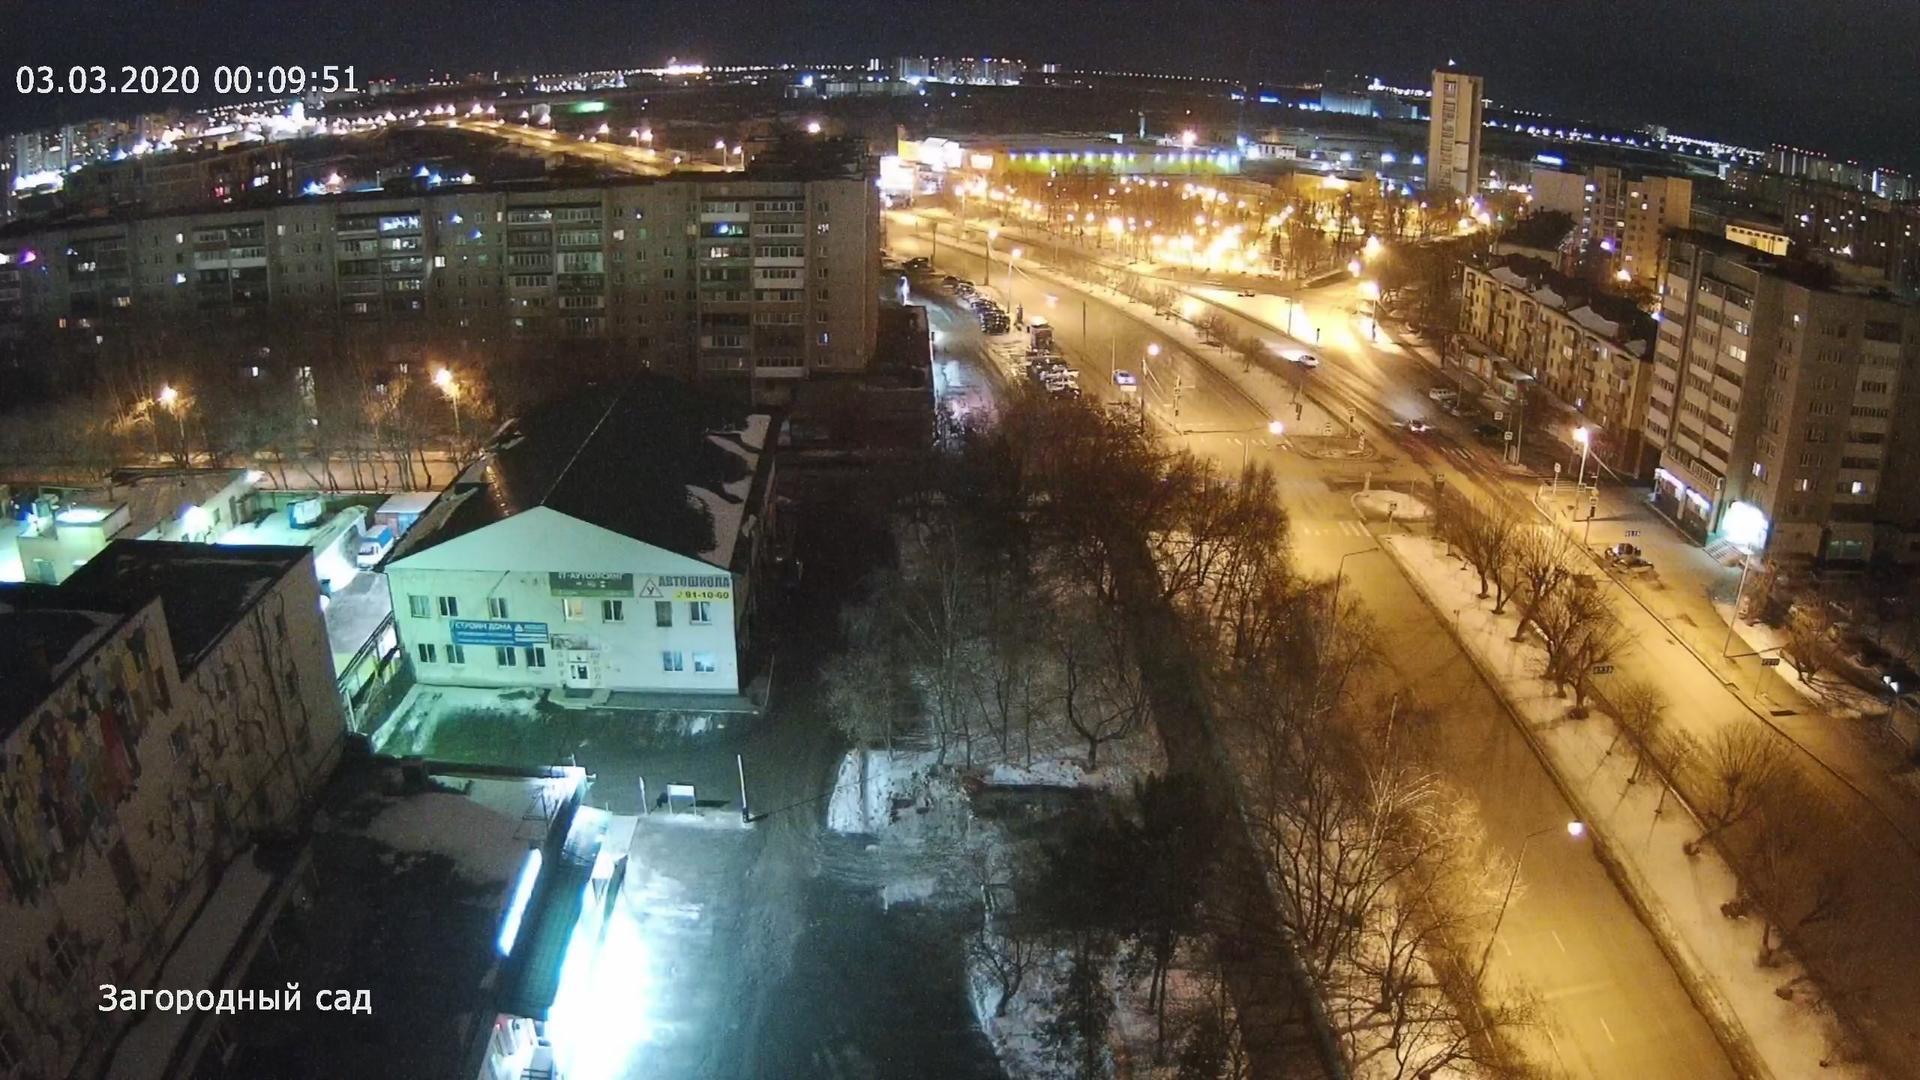 Webkamera Tyumen: Загородный сад